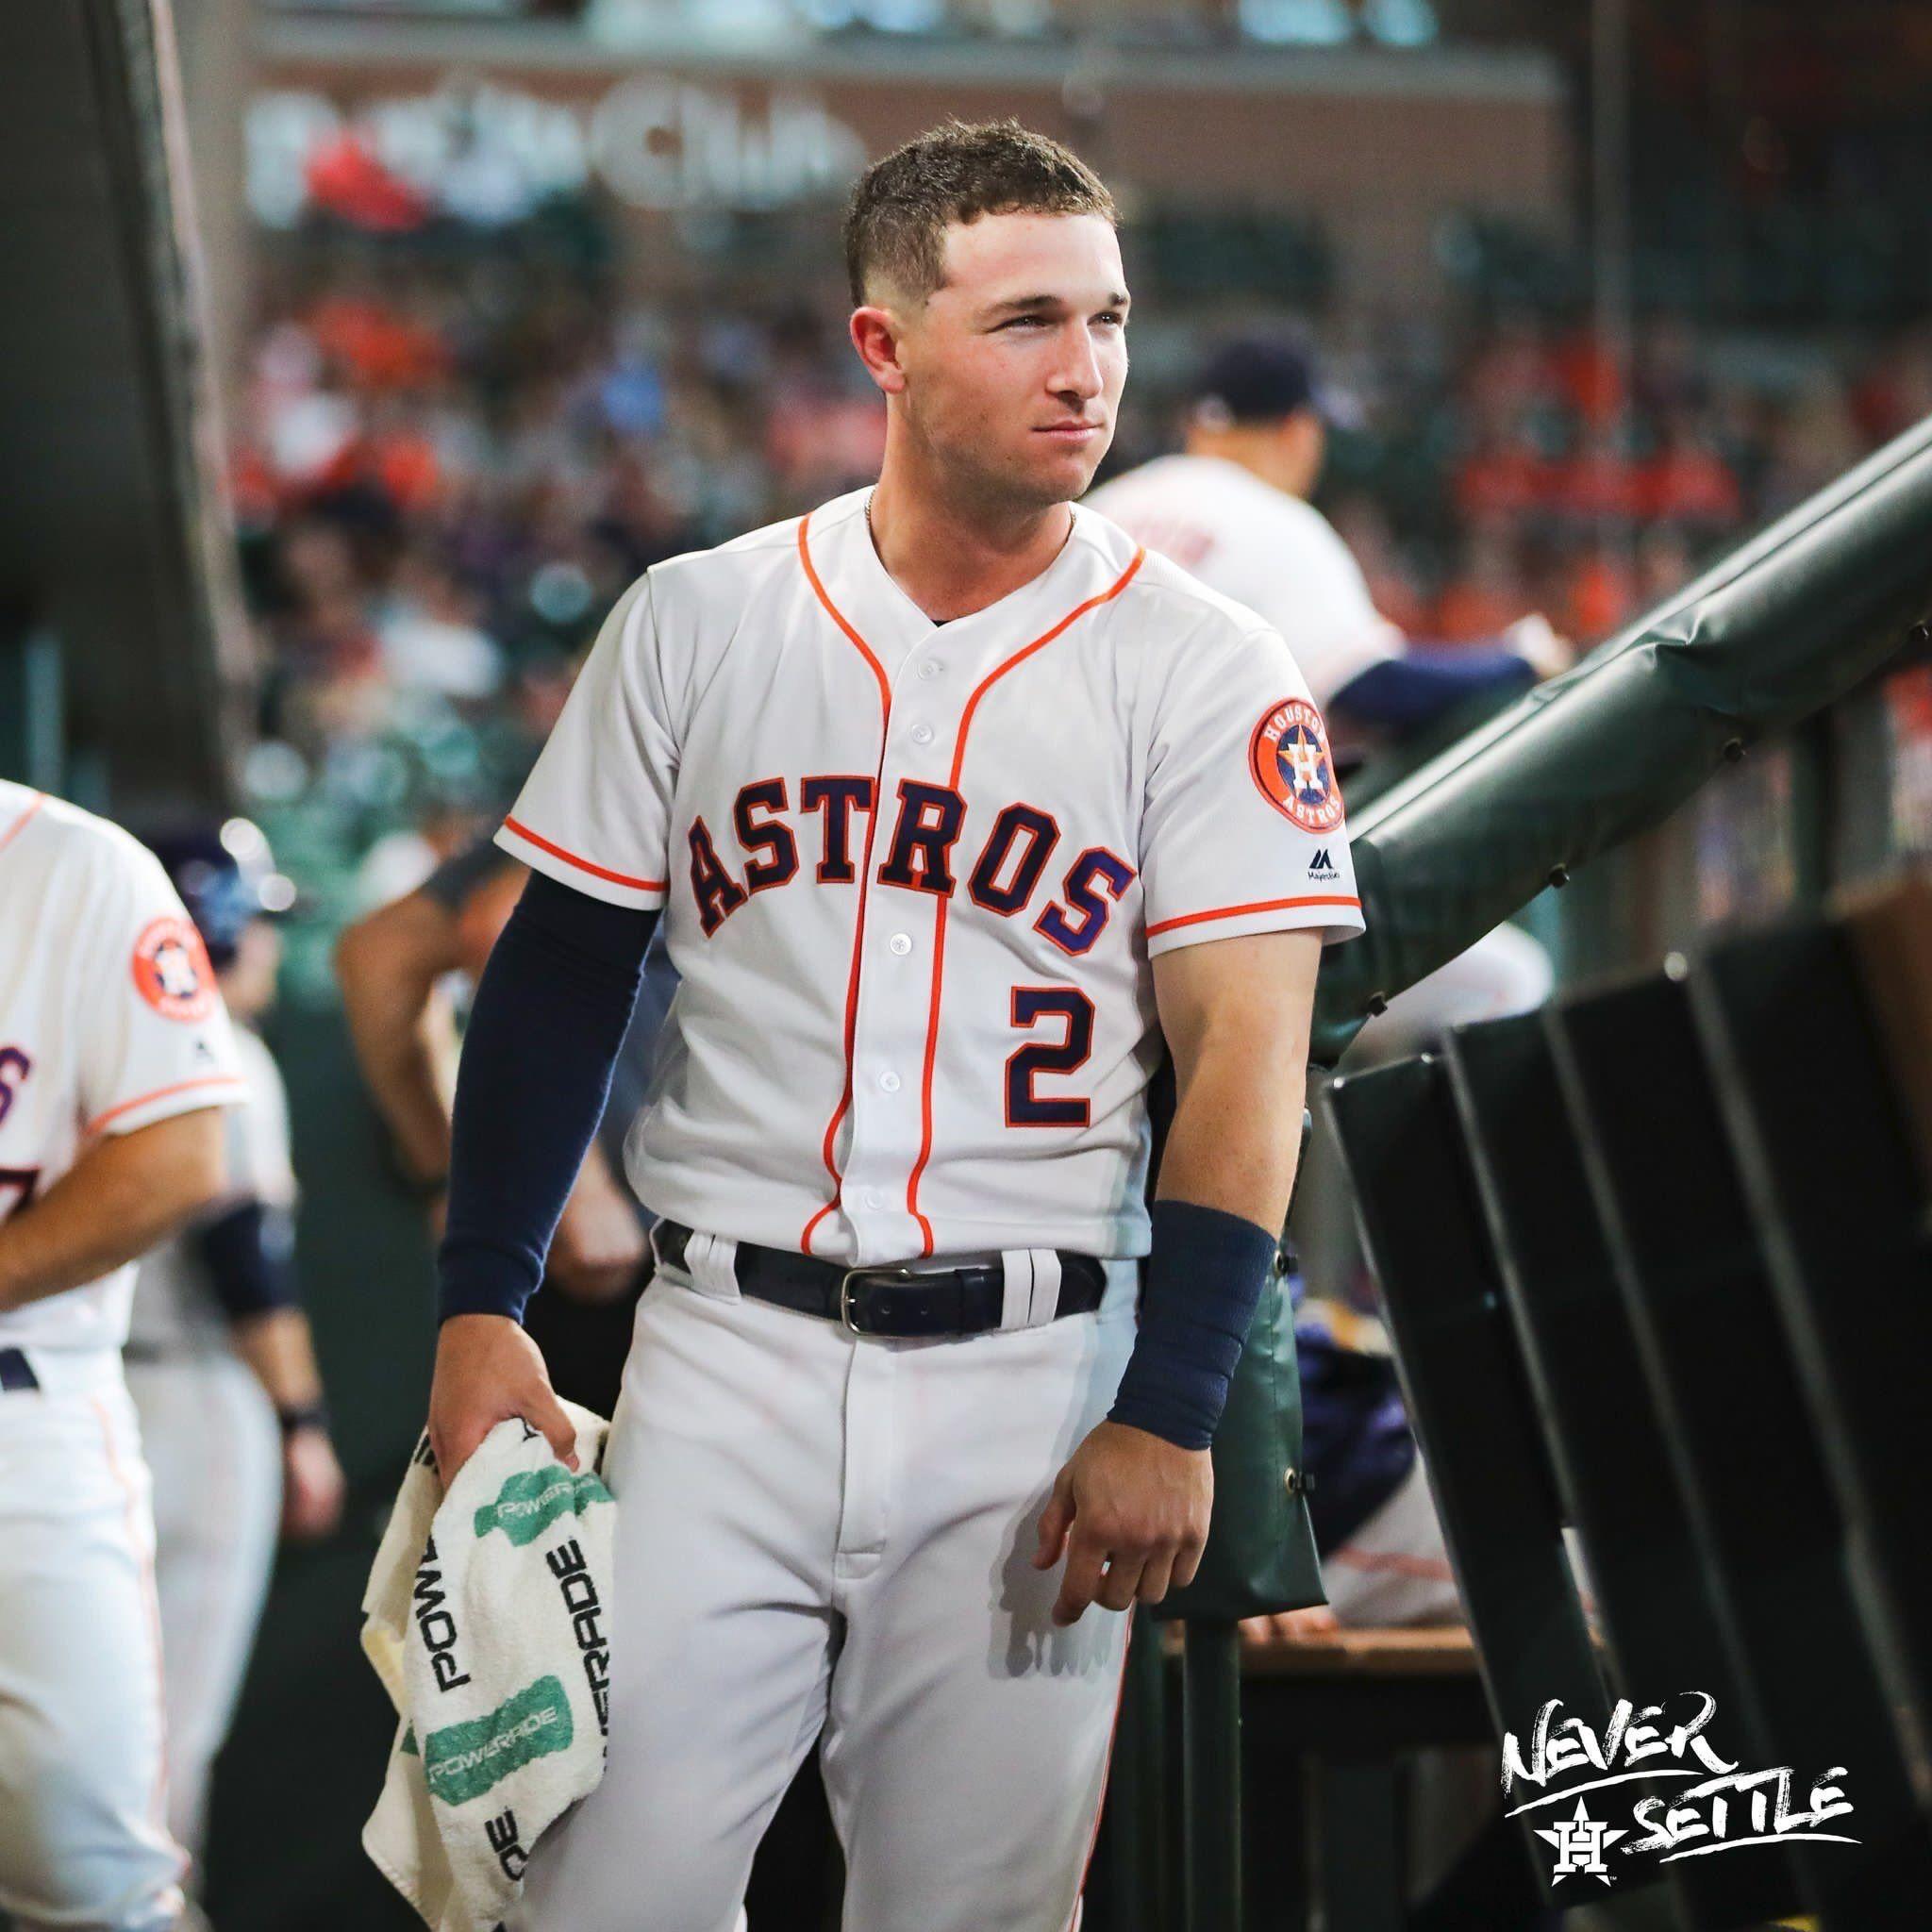 Alex Bregman Houston Astros New Arrivals Baseball Player Fade Jersey